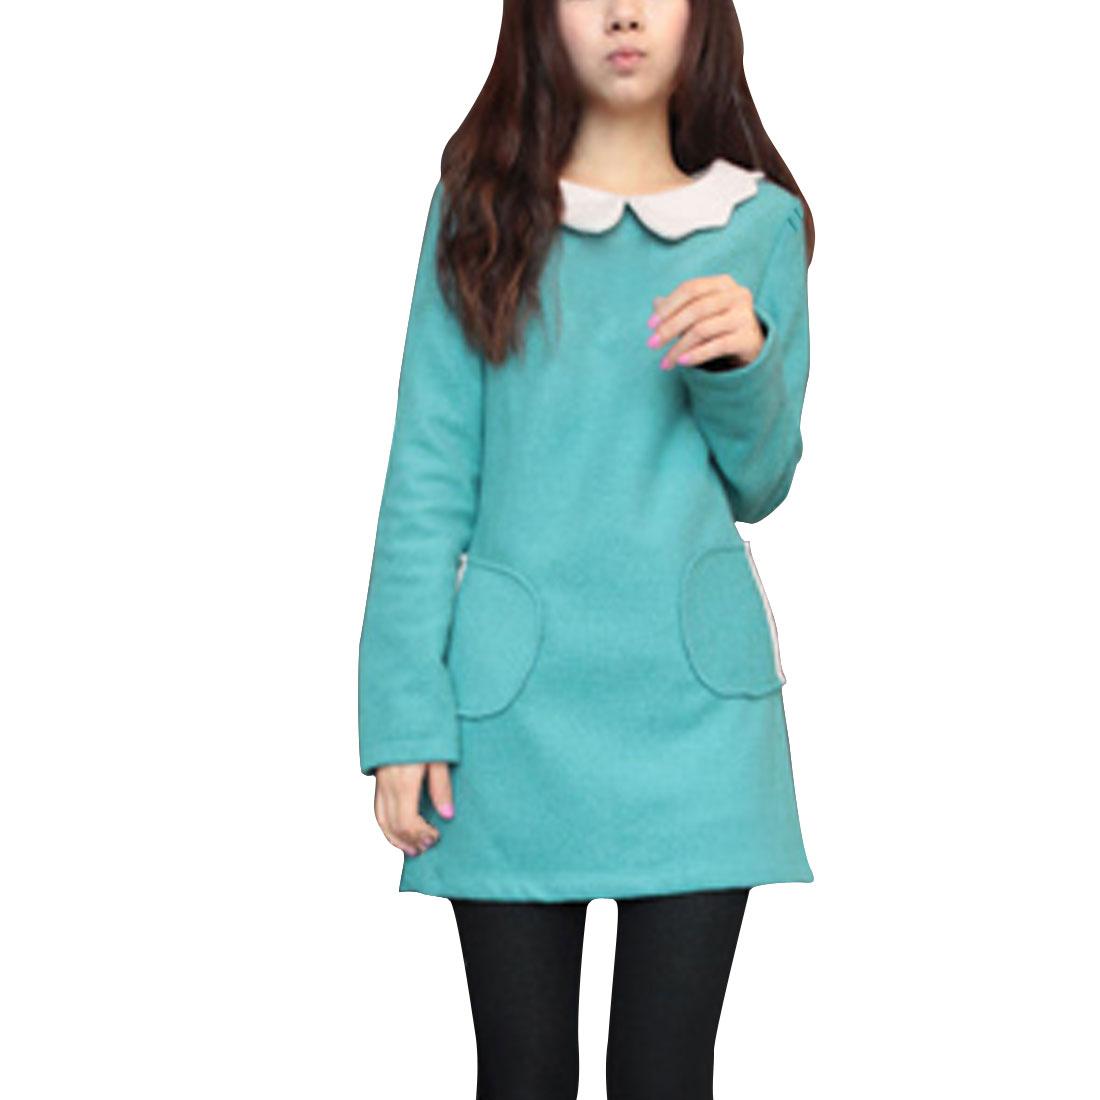 Ladies Lake Blue Puff Sleeves Casual Stylish Lining Tunic Shirt Xs